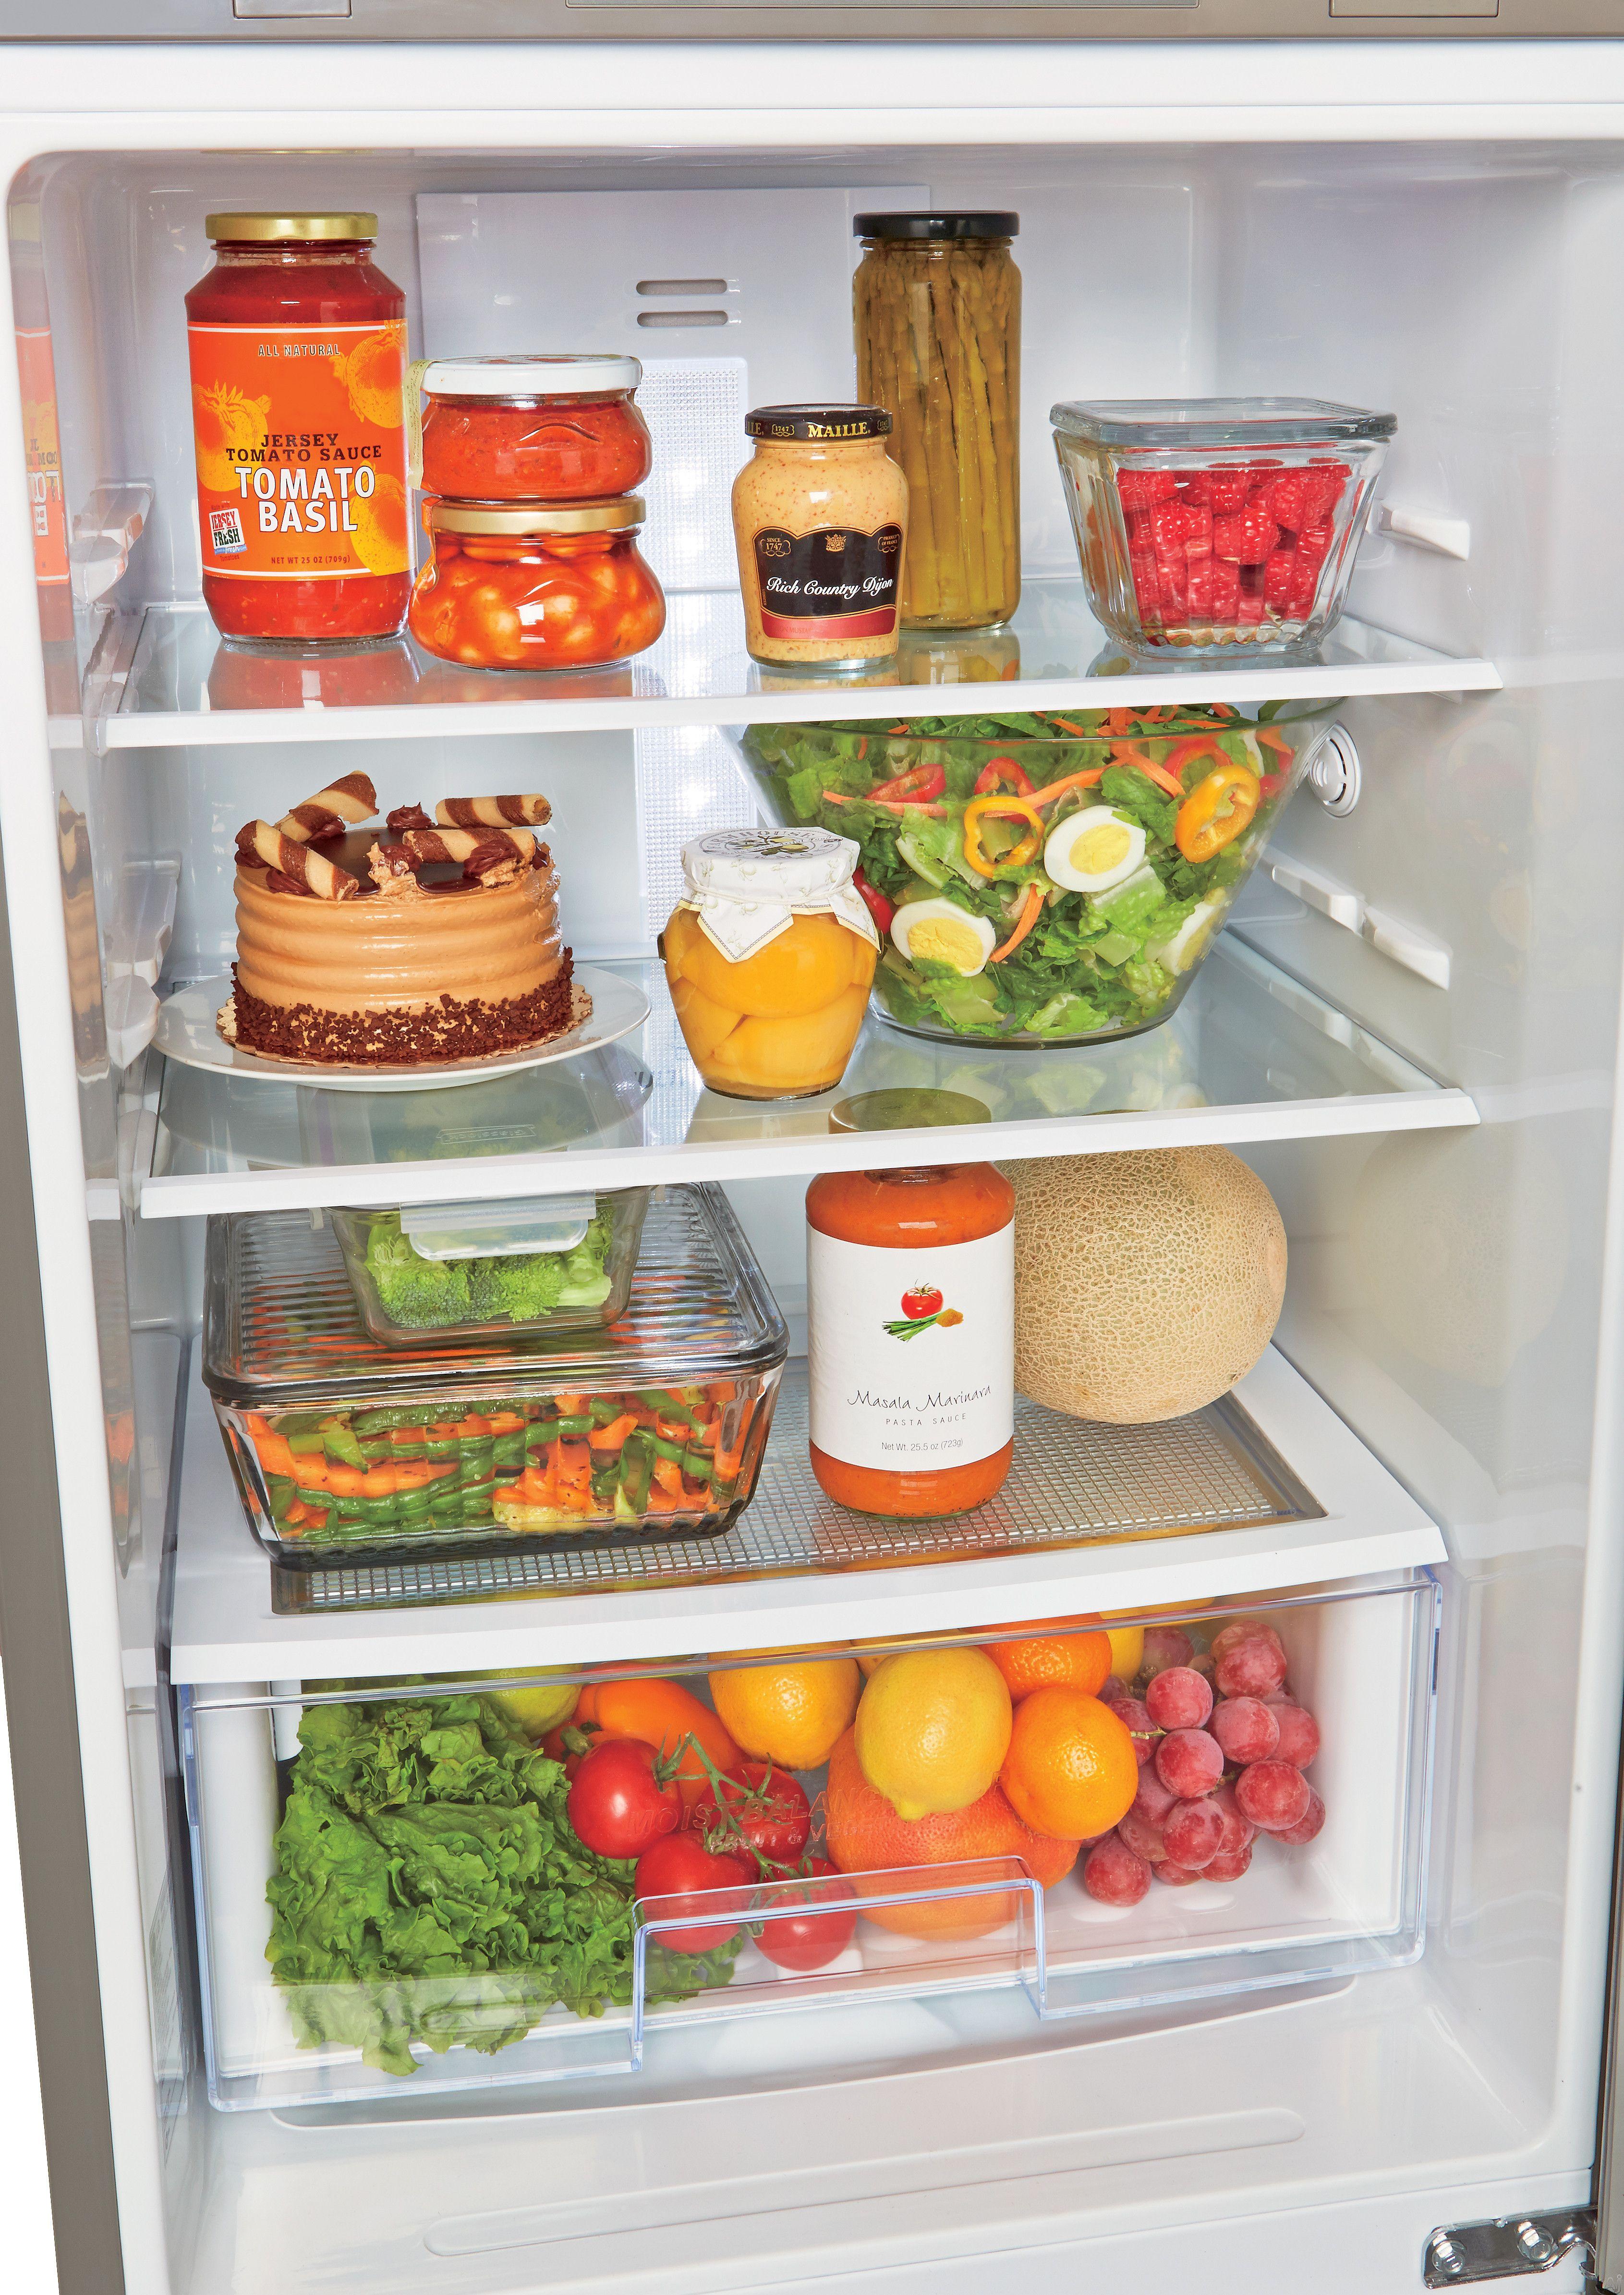 LG LBN10551PS 10.1 cu. ft. Bottom Freezer Refrigerator with 2 SpillProtector Glass Shelves, 5 Door Bins, 4 Freezer Drawers, Digital Temperature Controls and LoDecibel Quiet Operation